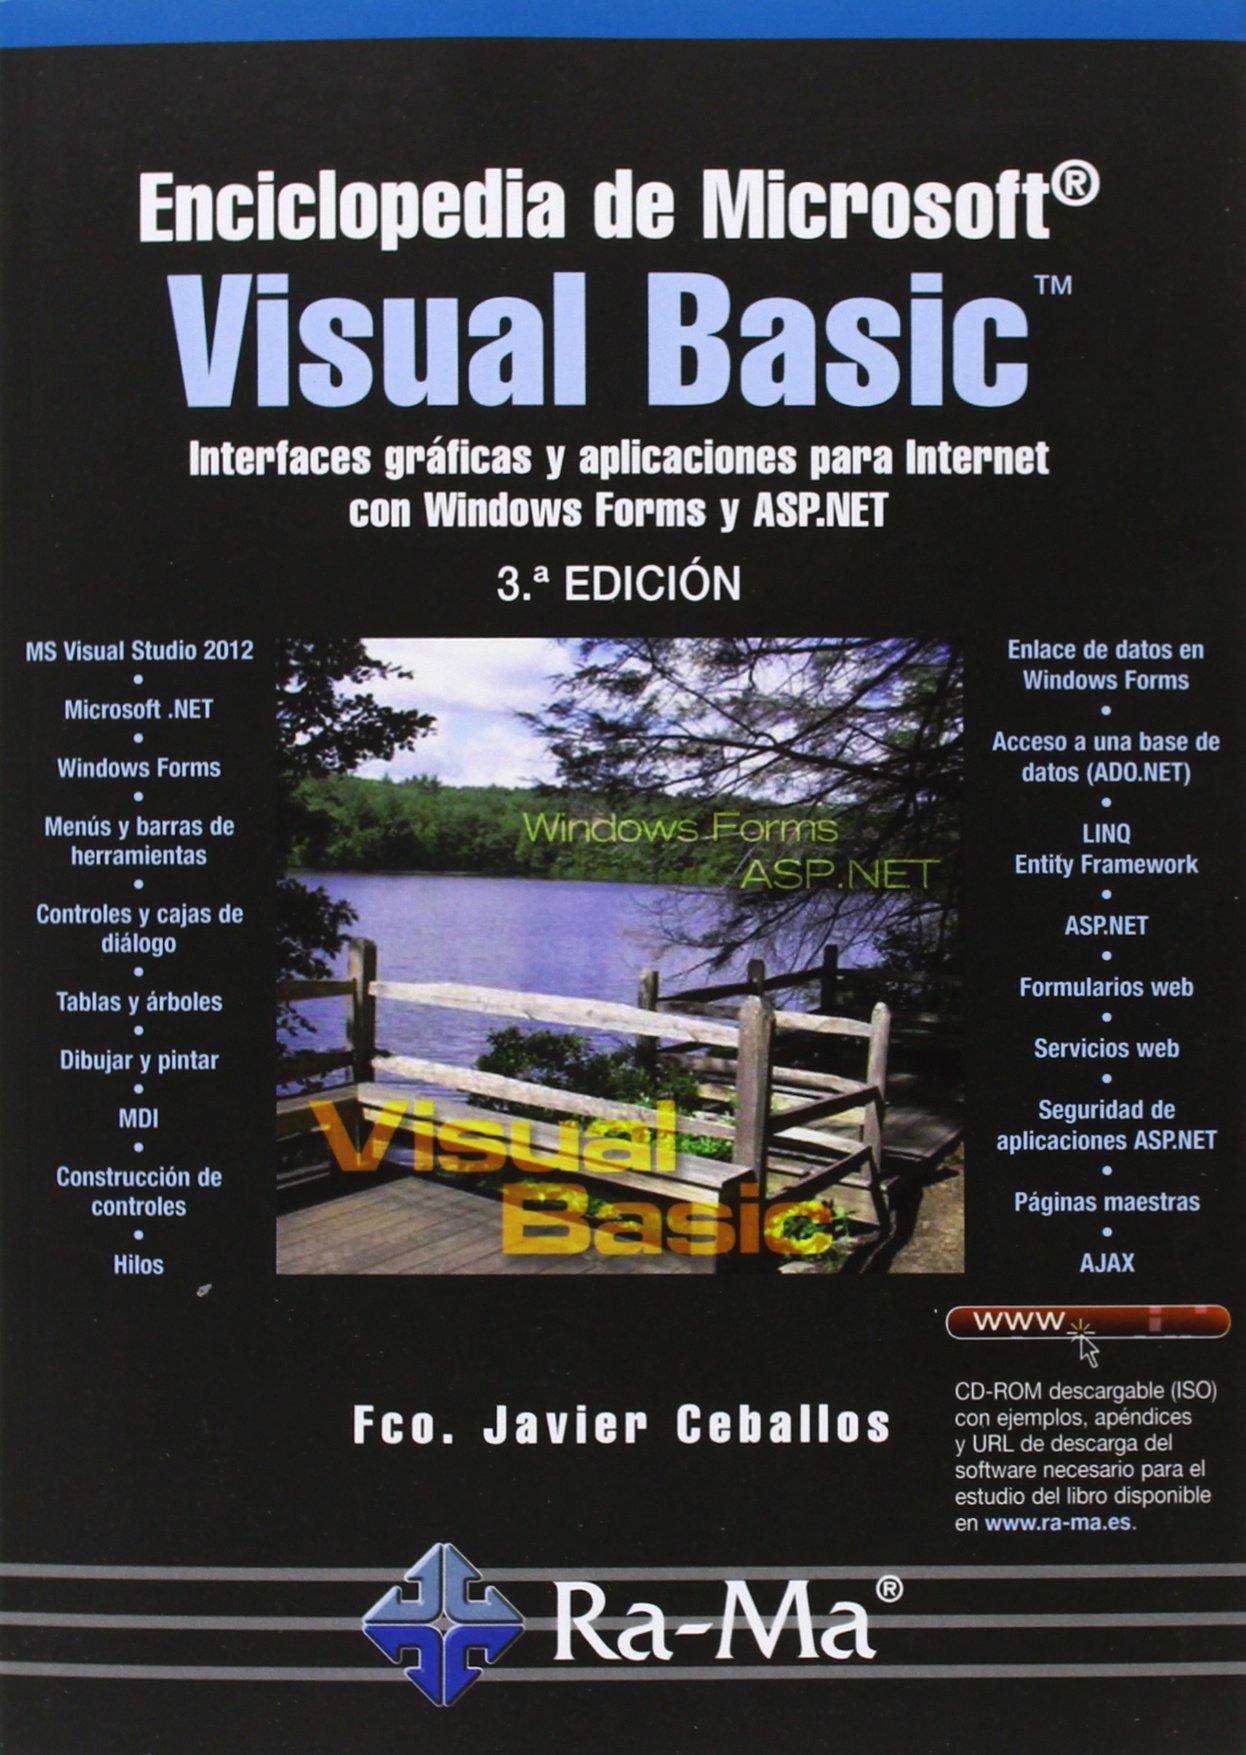 Enciclopedia de microsoft visual basic (Spanish) Paperback – January 1, 2013